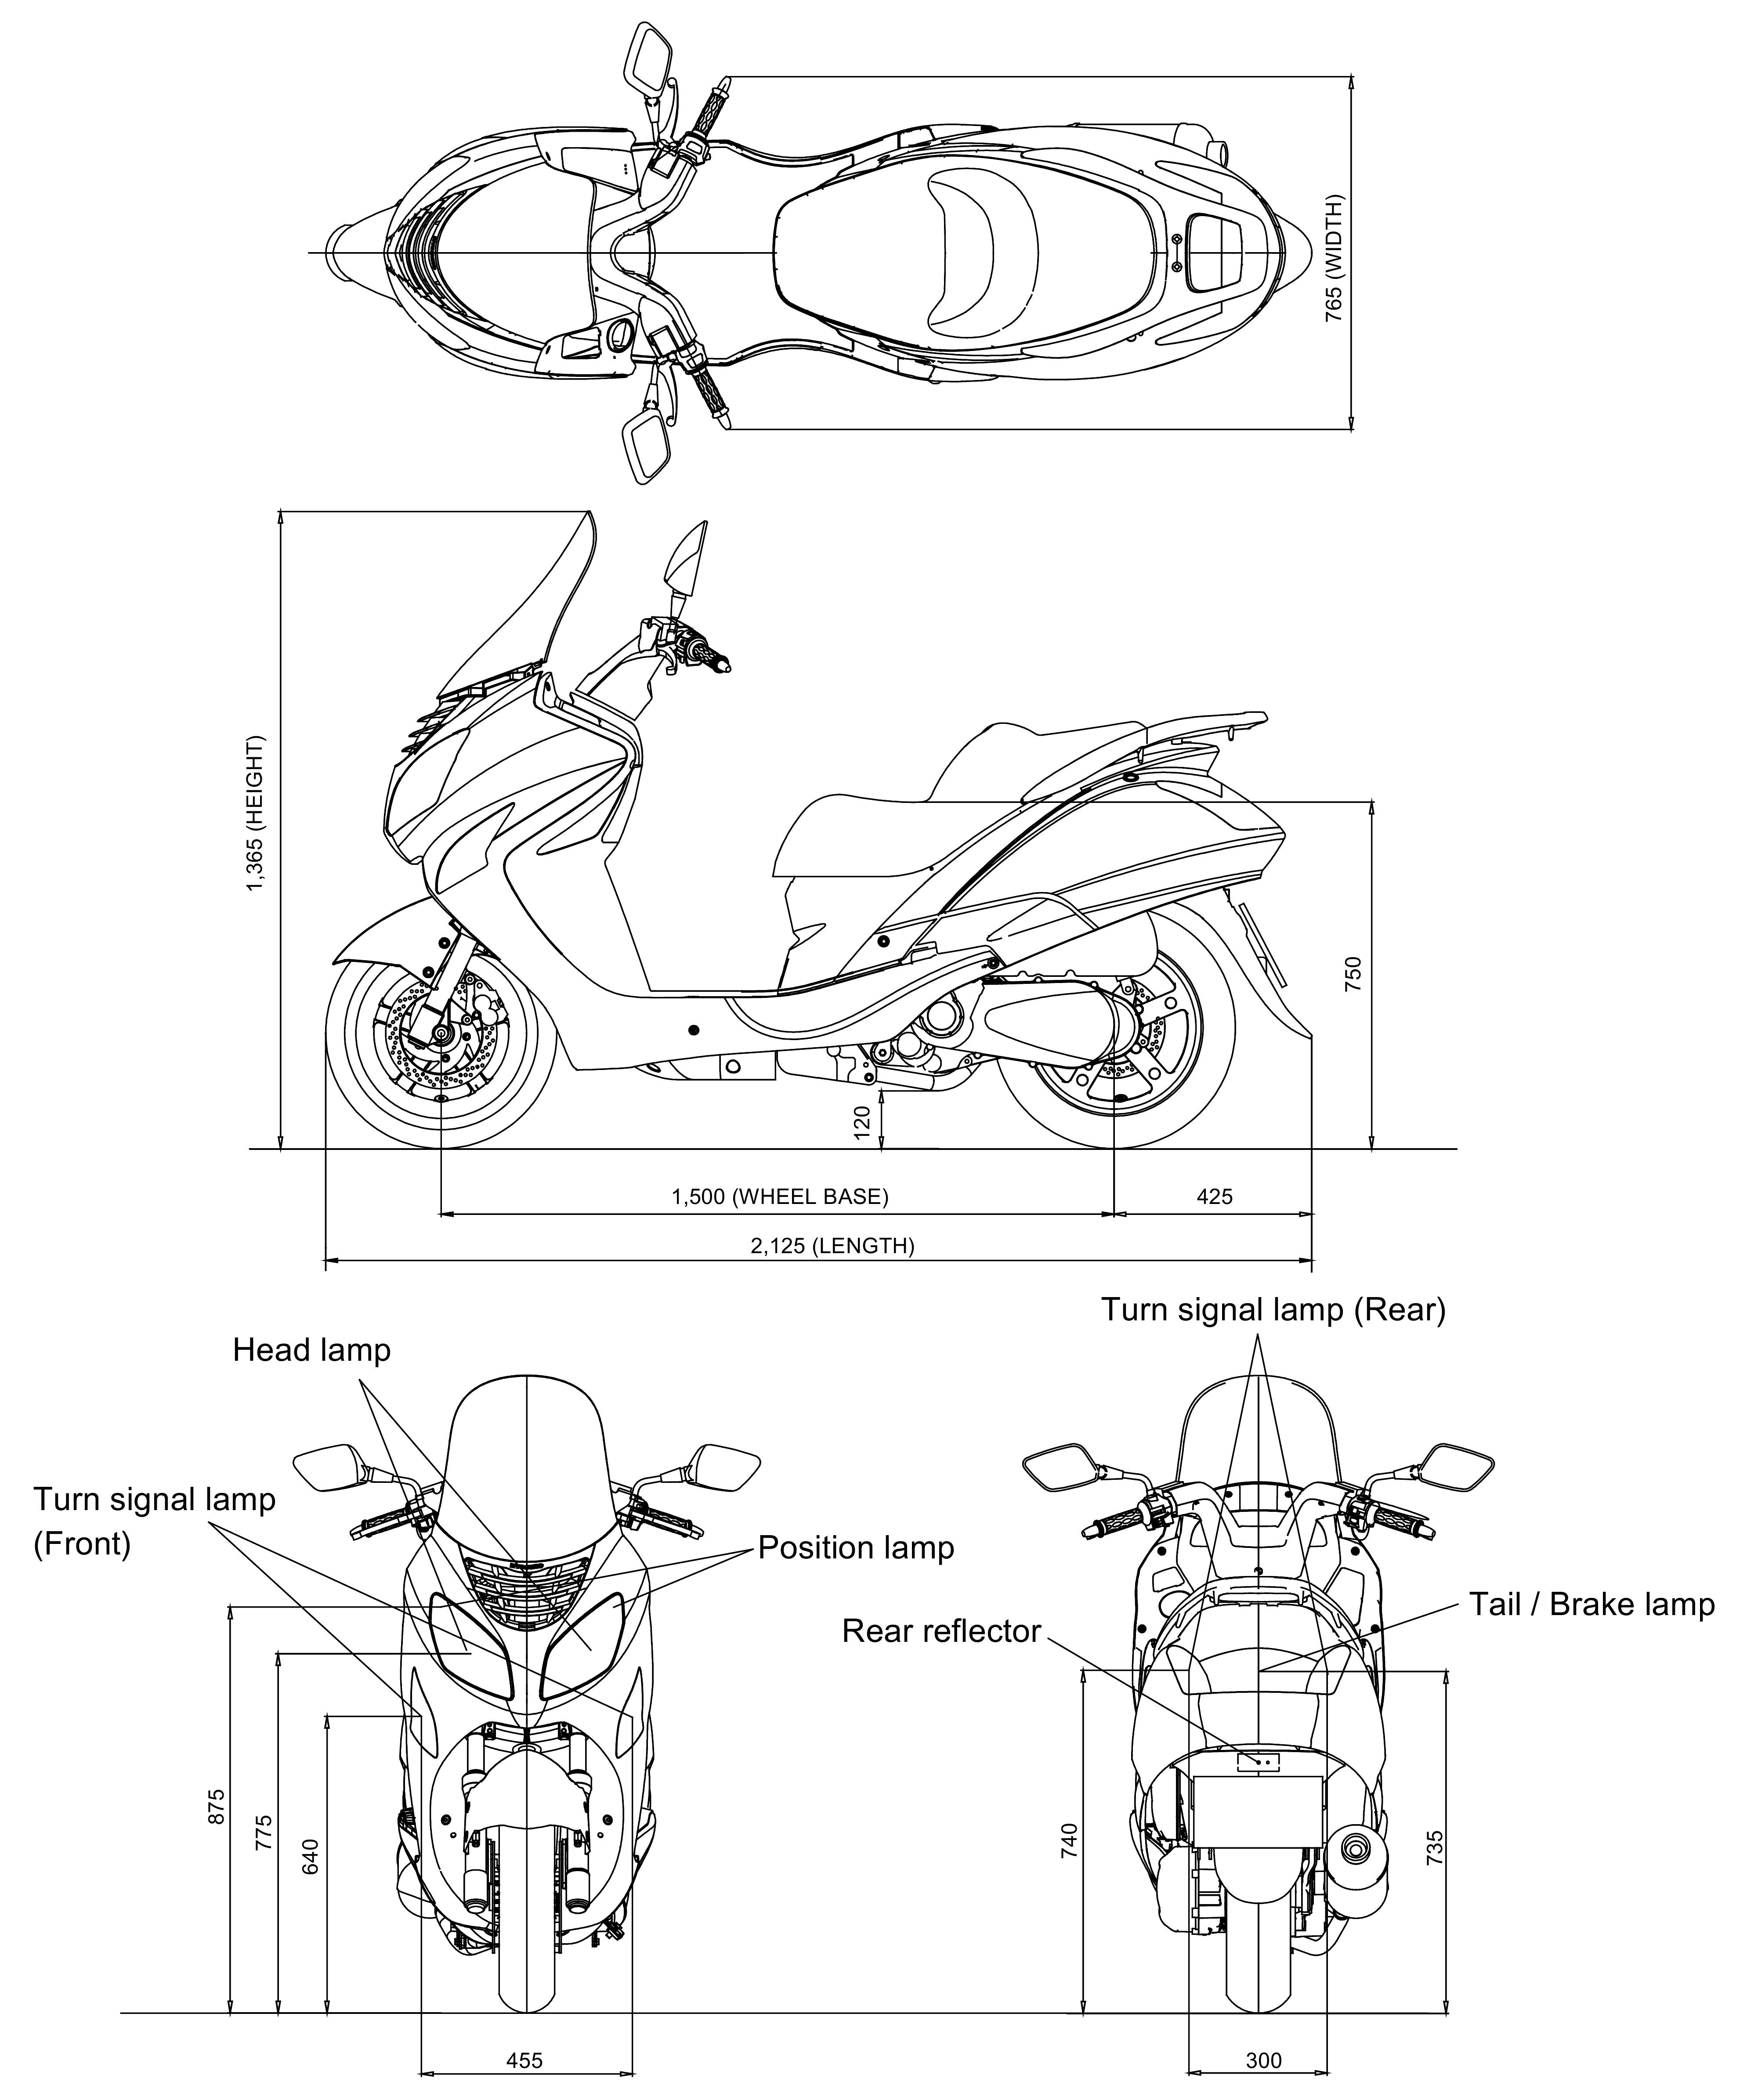 Hyosung MS3 250 blueprint